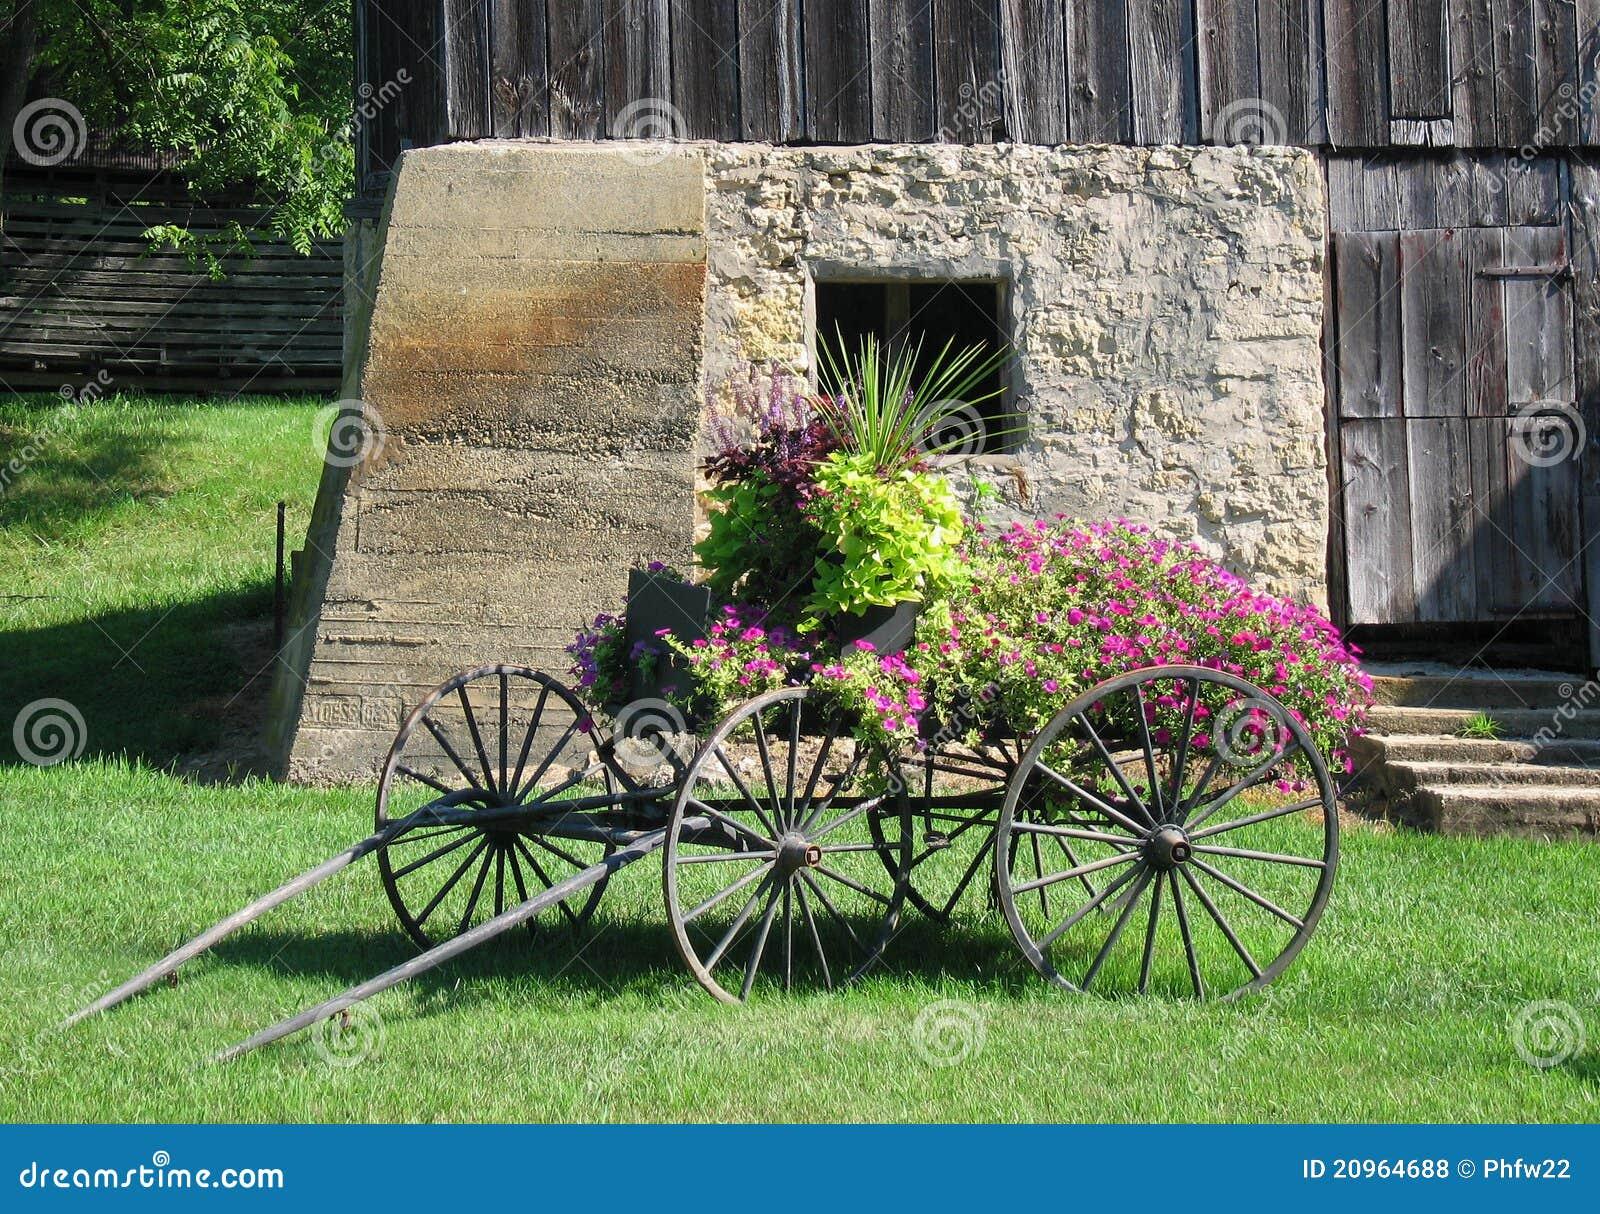 Antique Decorative Flower Cart Stock Photo - Image of horse ...